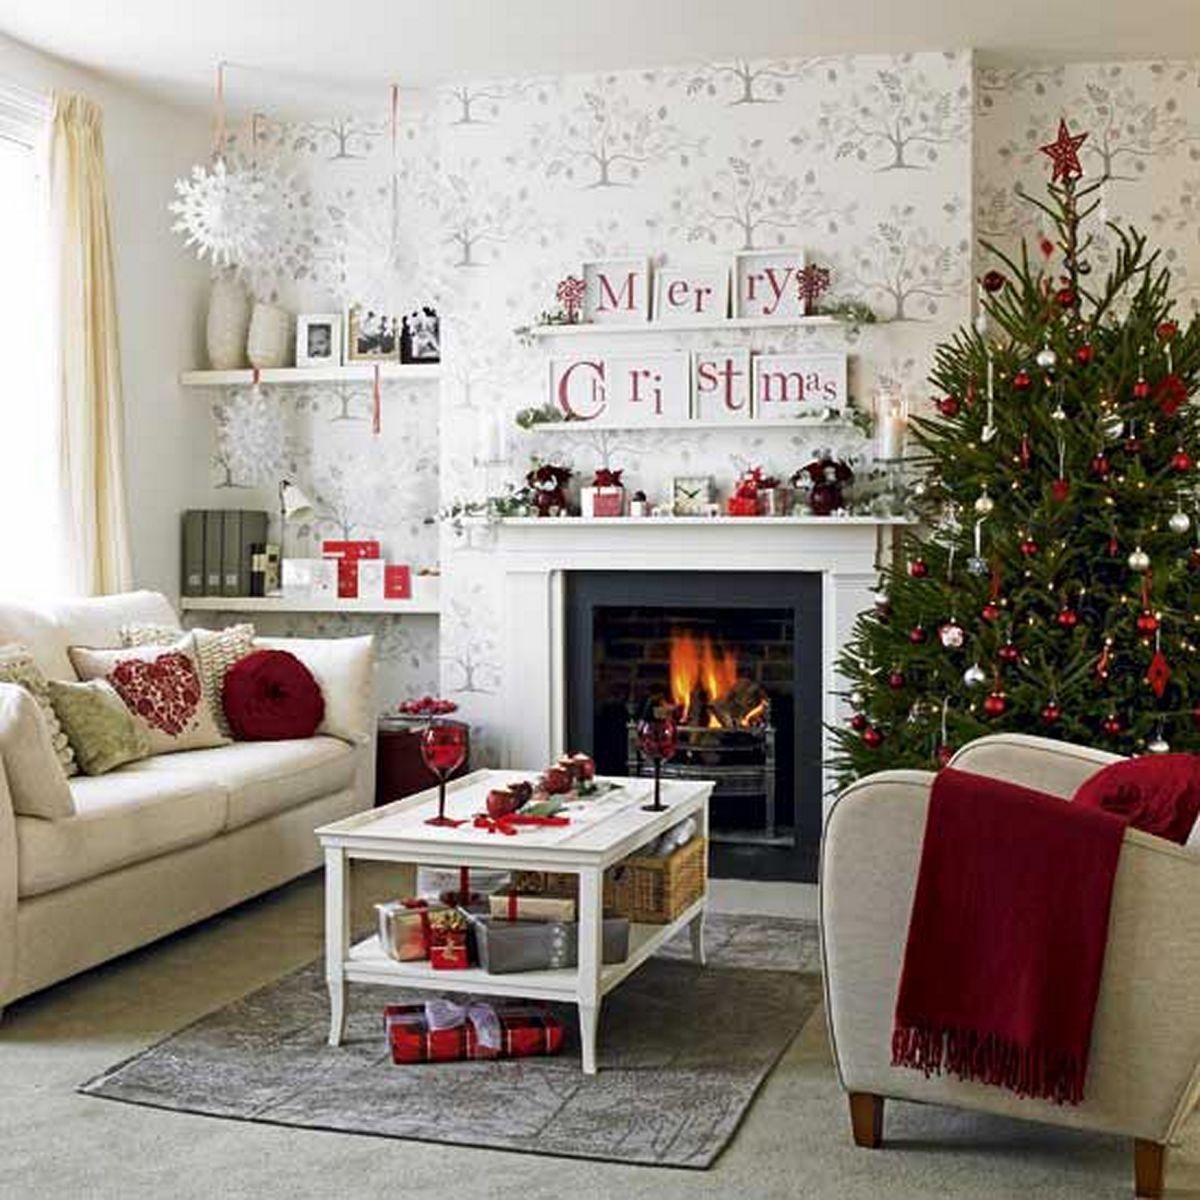 Cozy living rooms